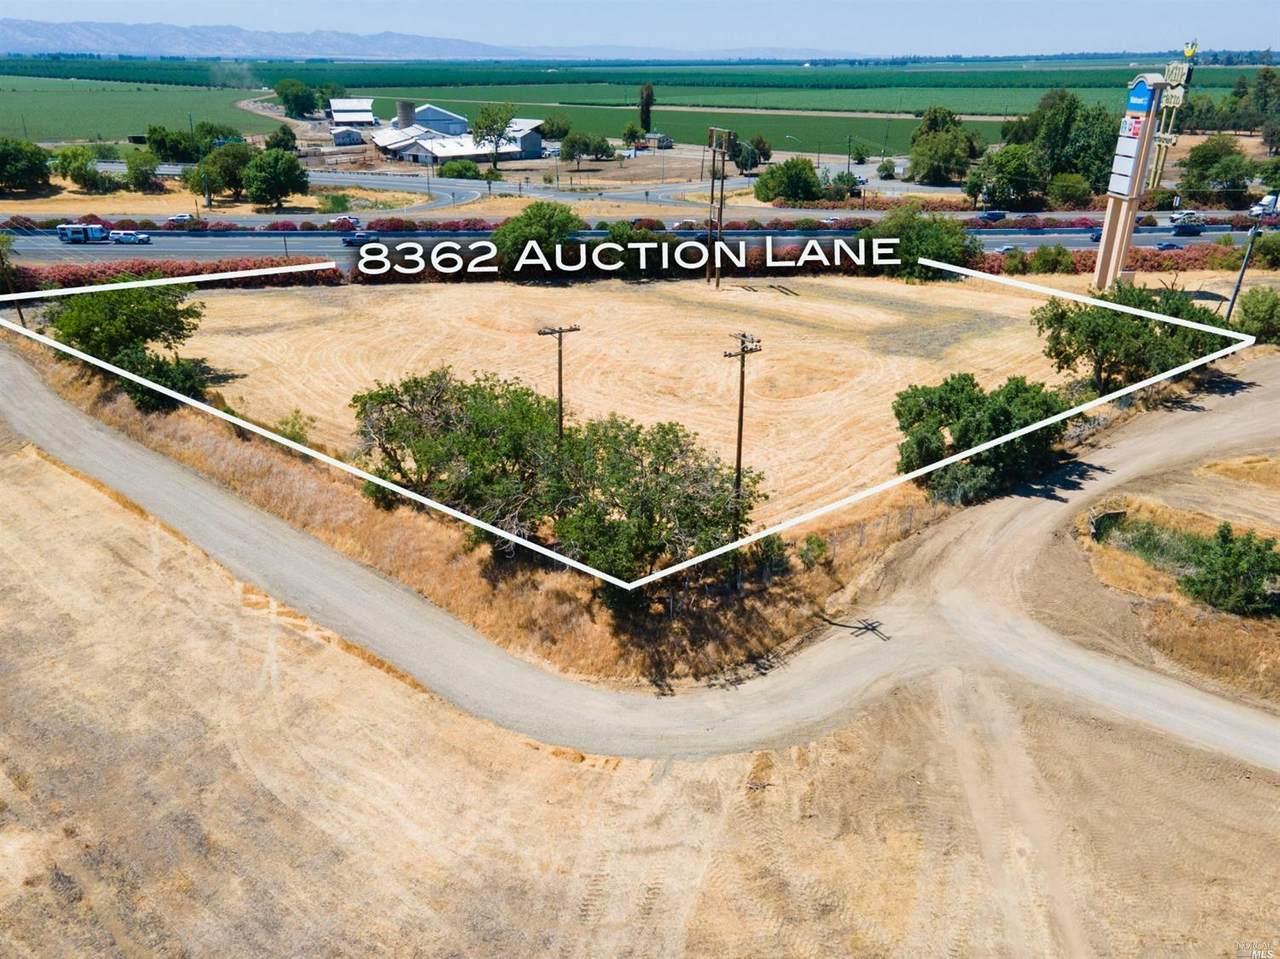 8362 Auction Lane - Photo 1